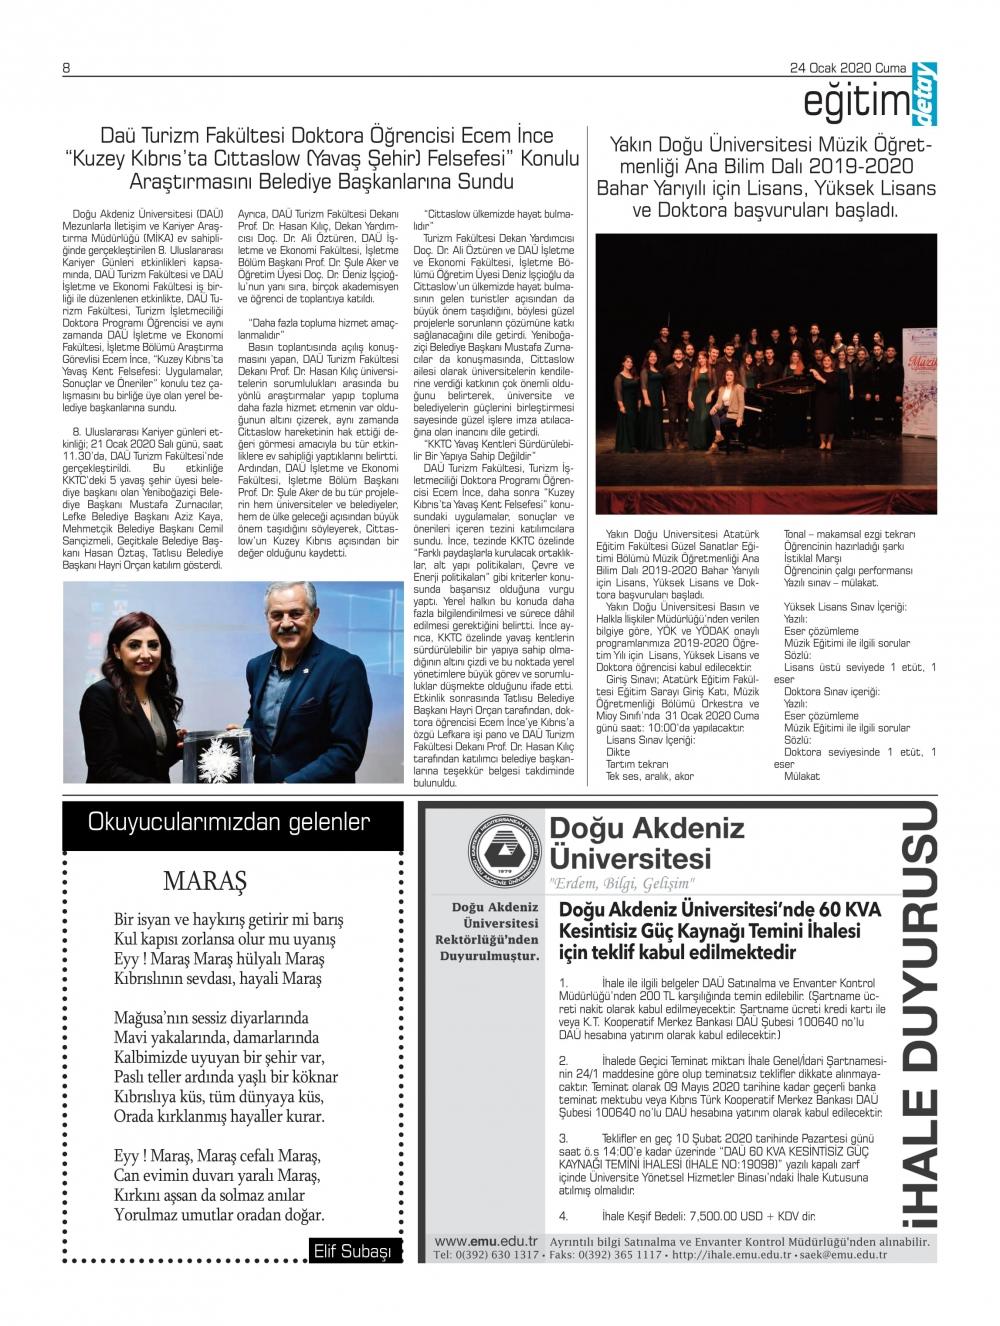 Detay Gazetes 24 Ocak 2020 galerisi resim 9